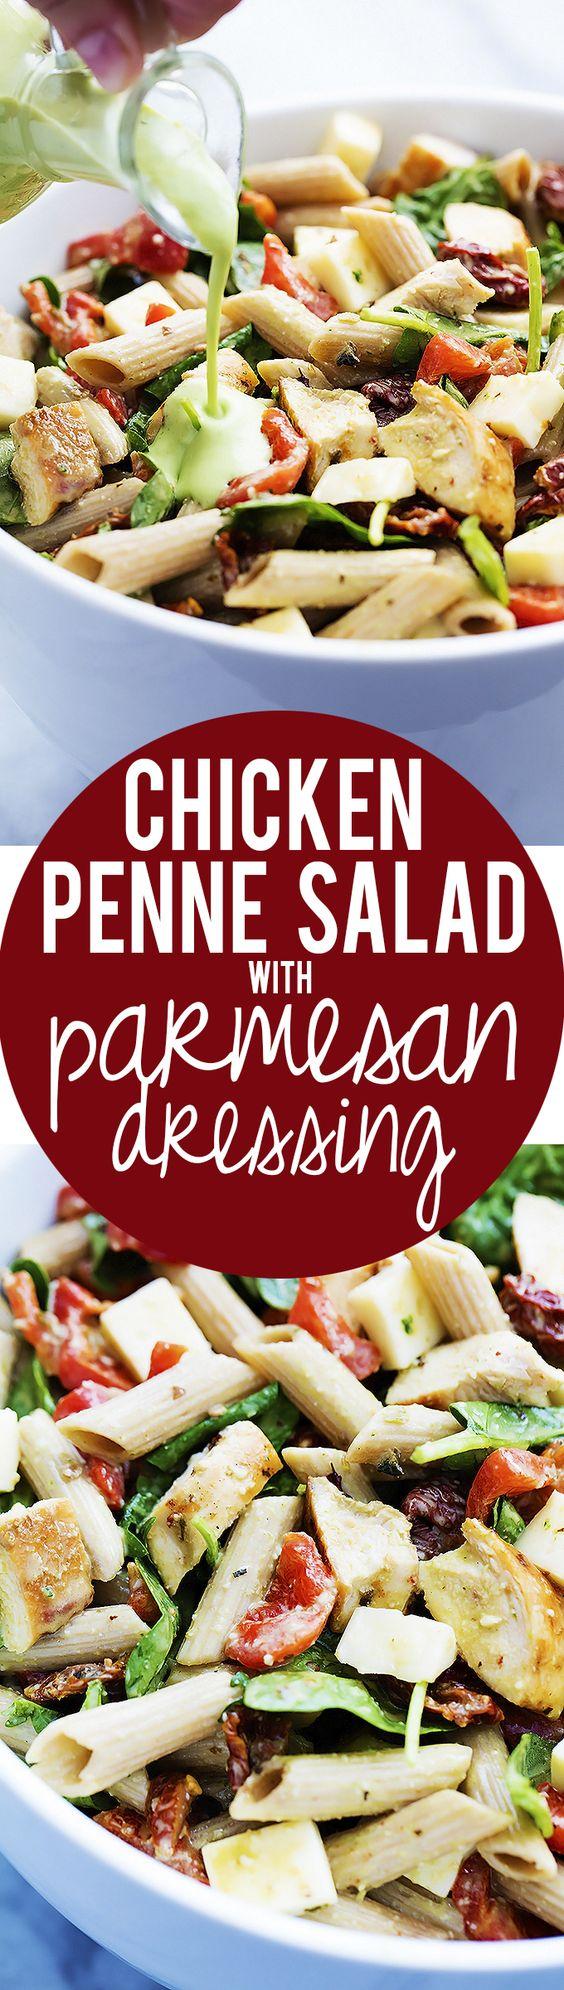 Chicken Penne Salad with Creamy Parmesan Dressing | Recipe | Chicken ...